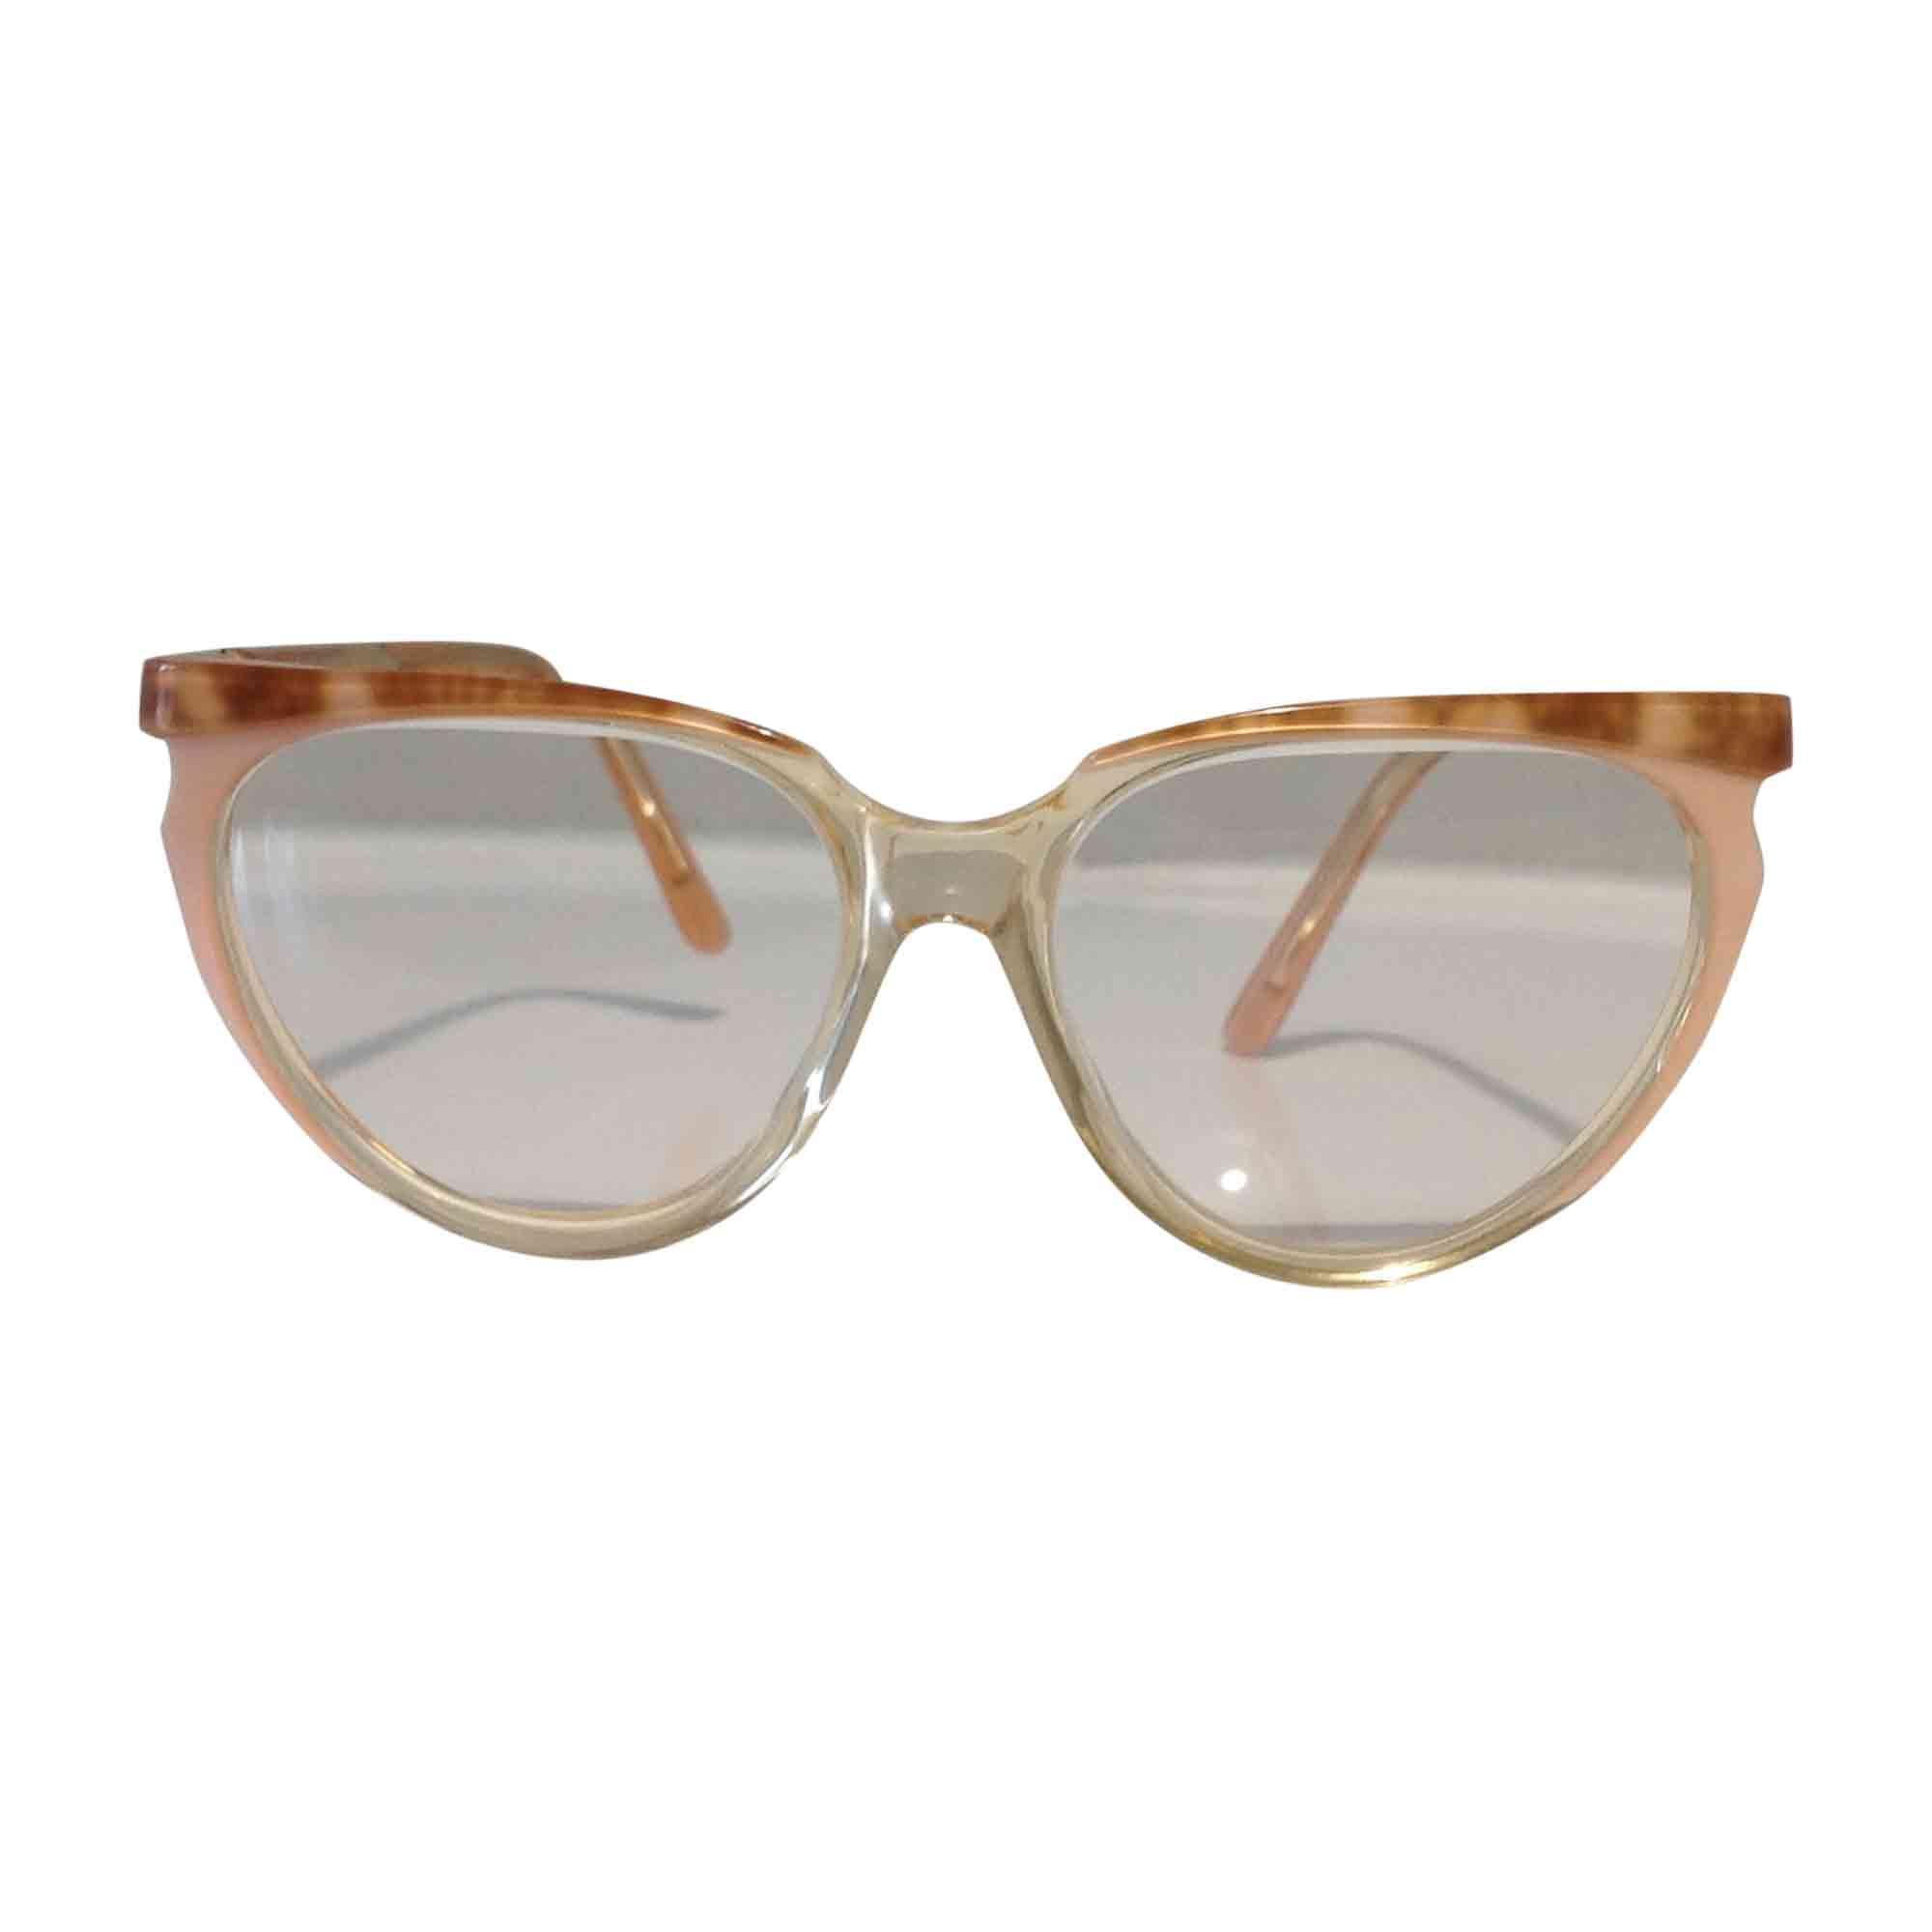 monture de lunettes yves saint laurent beige 5455678. Black Bedroom Furniture Sets. Home Design Ideas